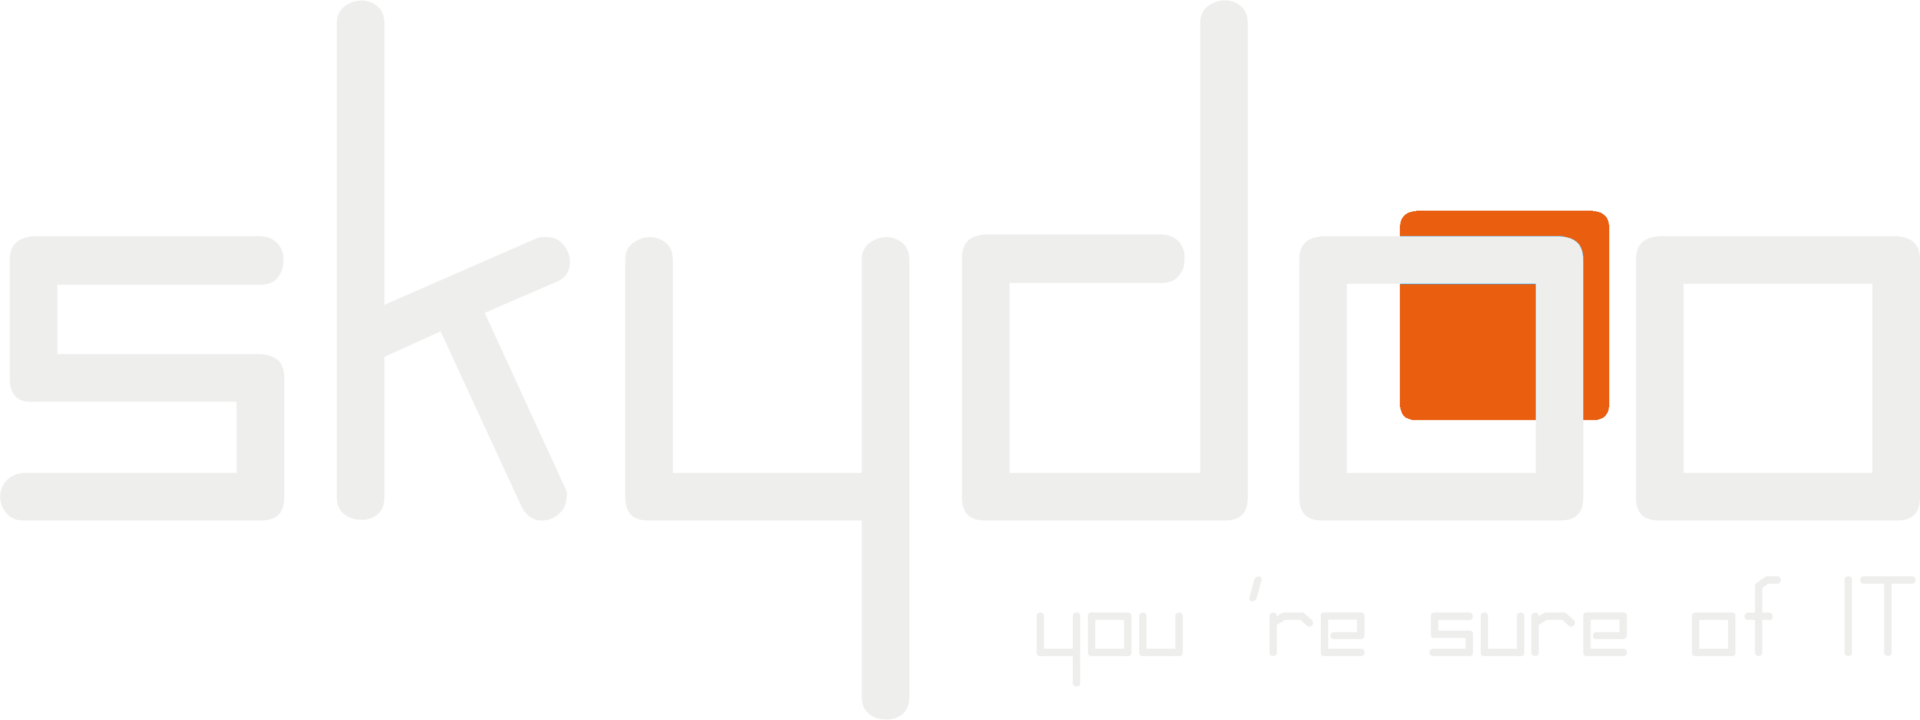 Logo de Skydoo